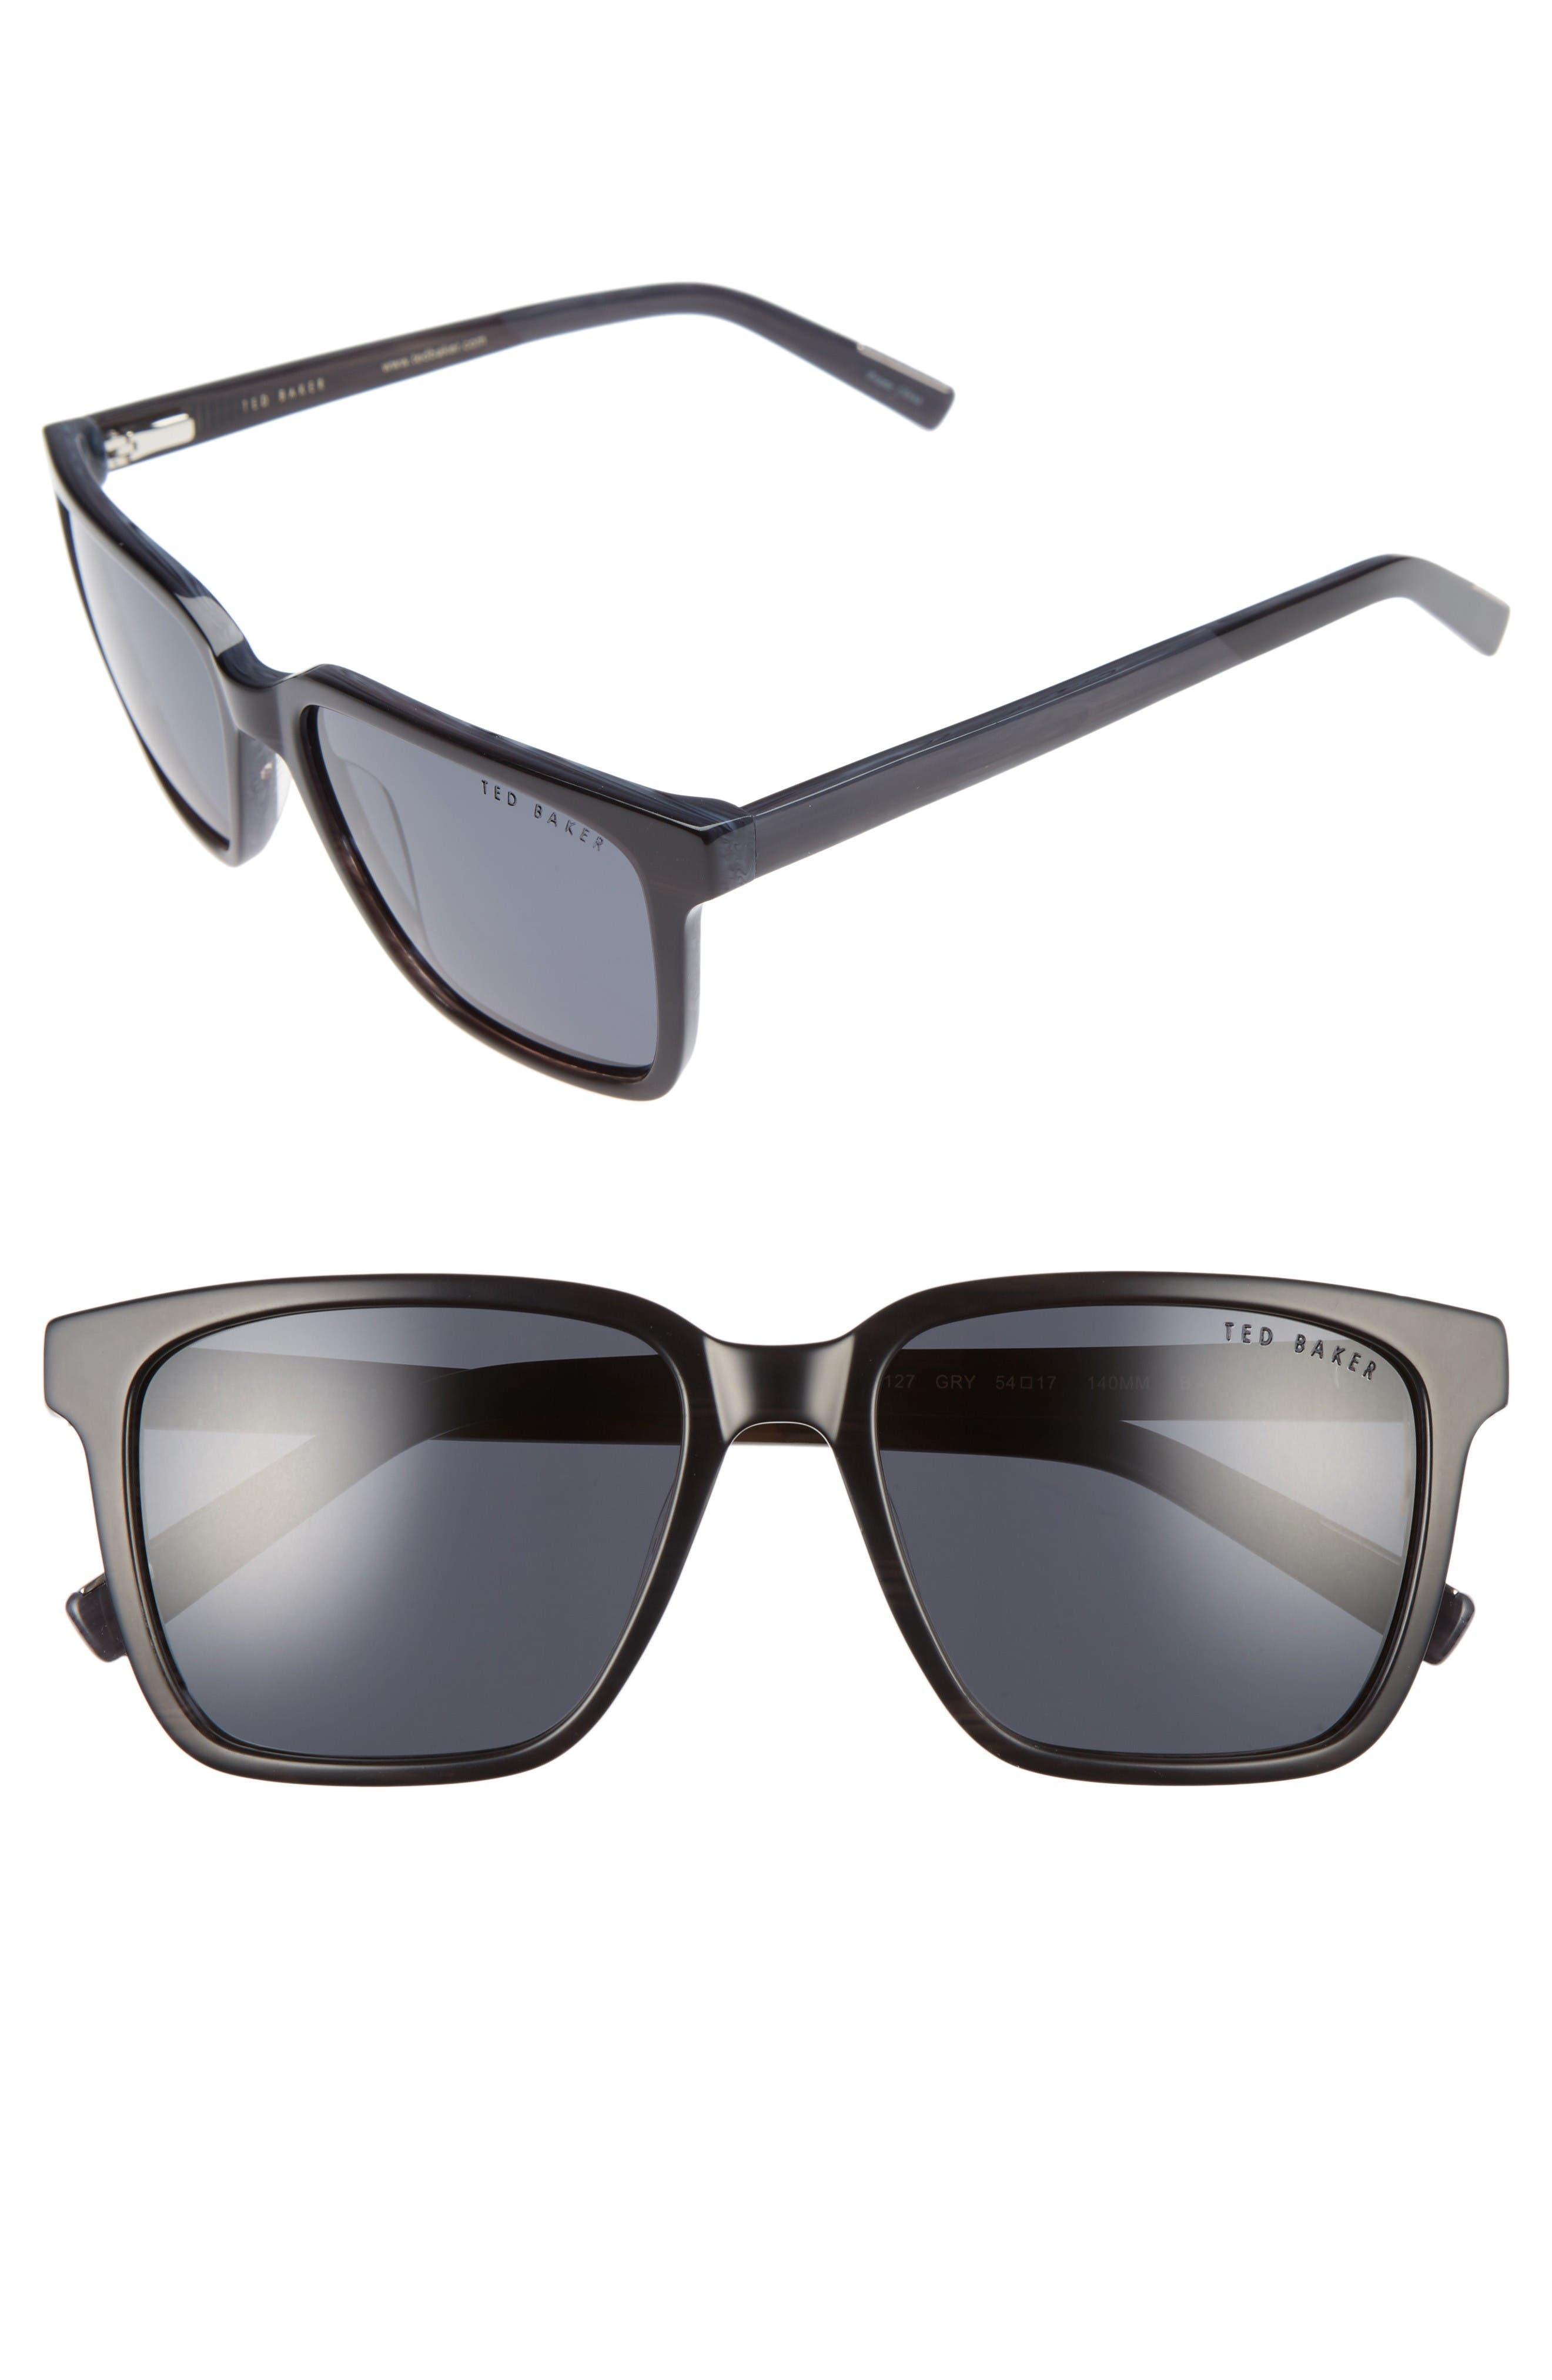 Main Image - Ted Baker London 54mm Polarized Sunglasses